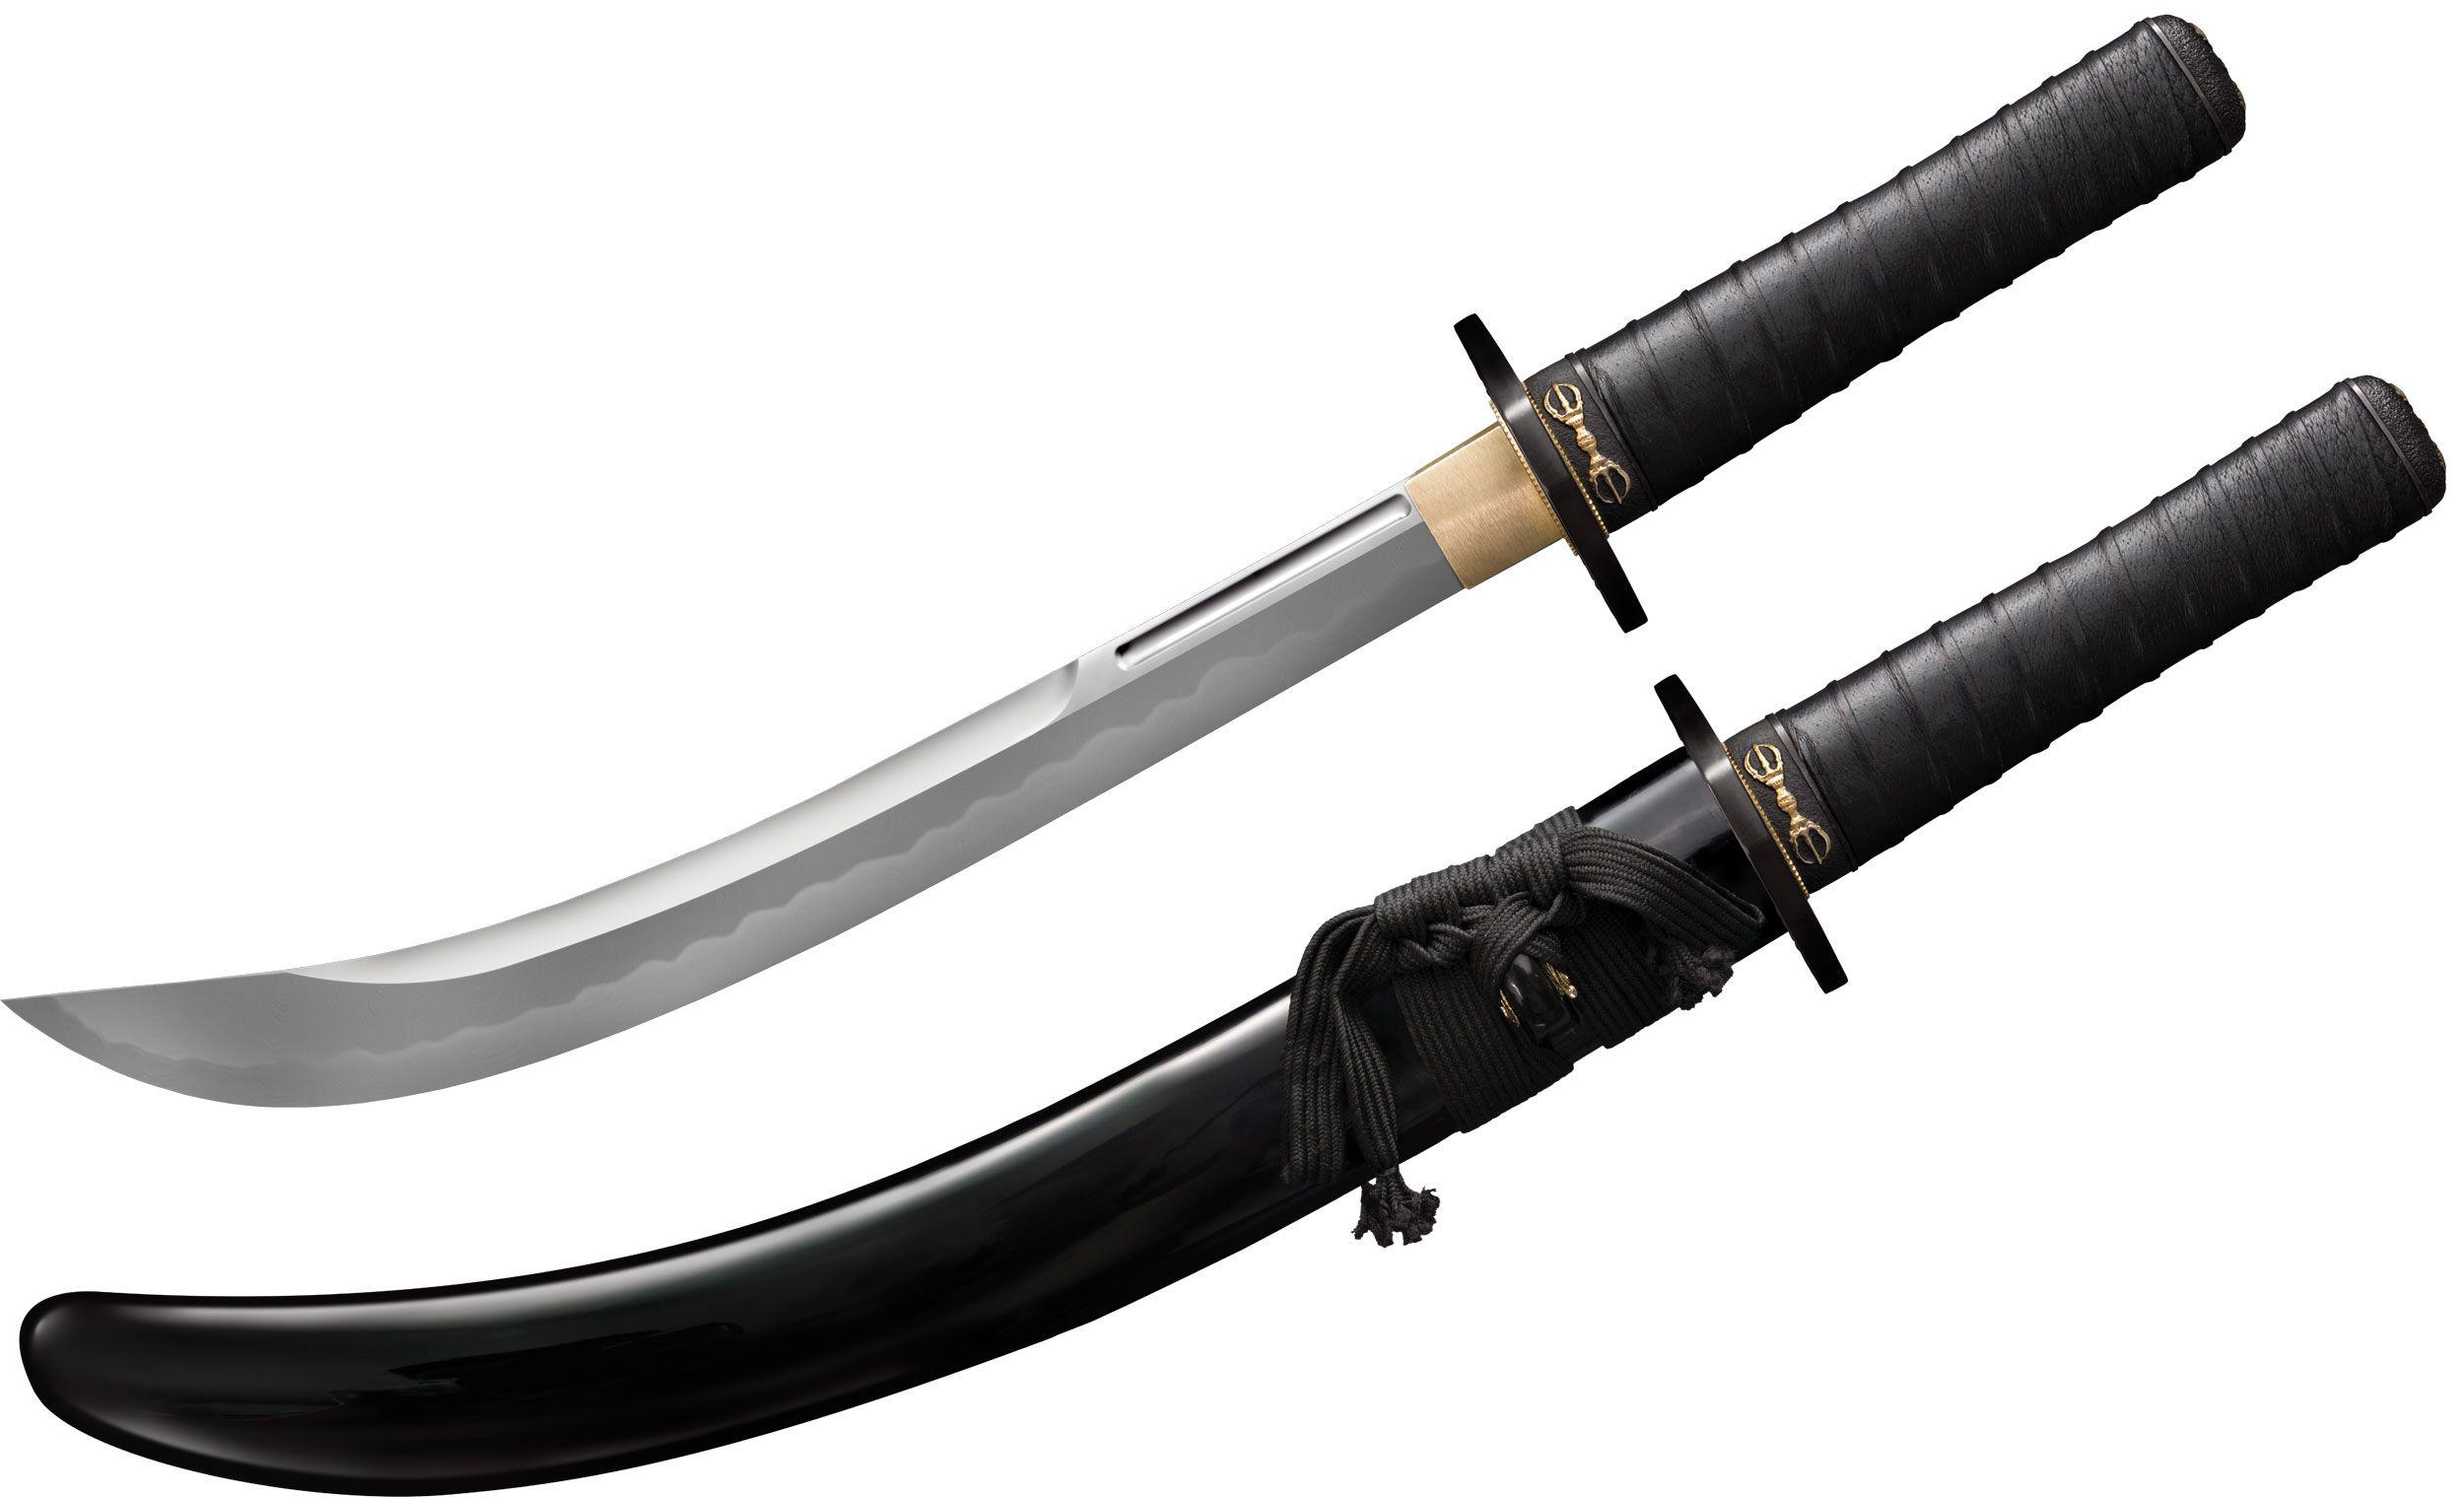 Cold Steel 88PKW Steven Seagal Signature Wakizashi 15.25 inch Damascus Blade, Lacquered Wood Scabbard